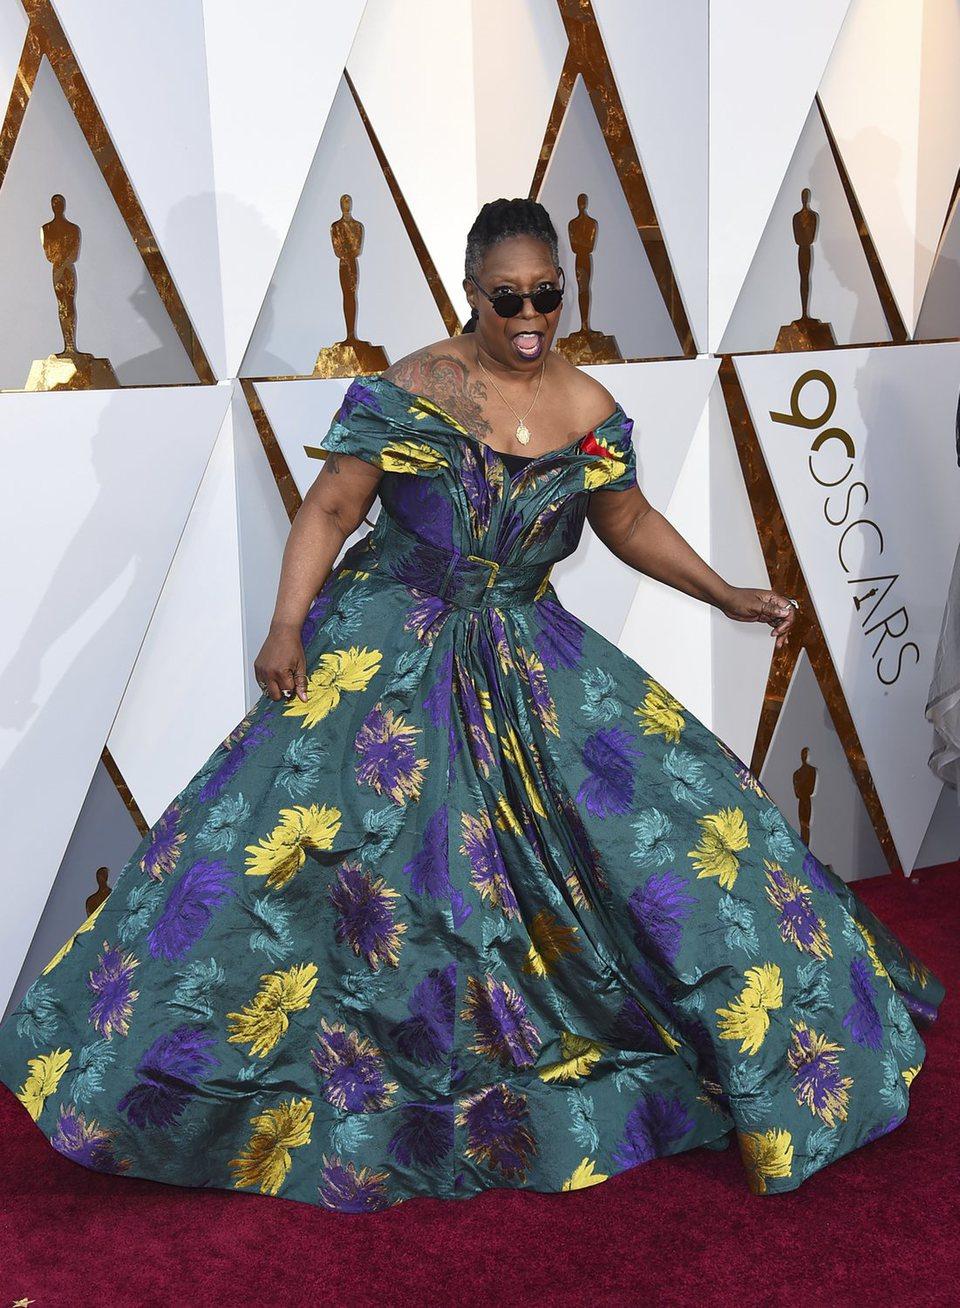 Whoopi Goldberg en la alfombra roja de los Oscar 2018